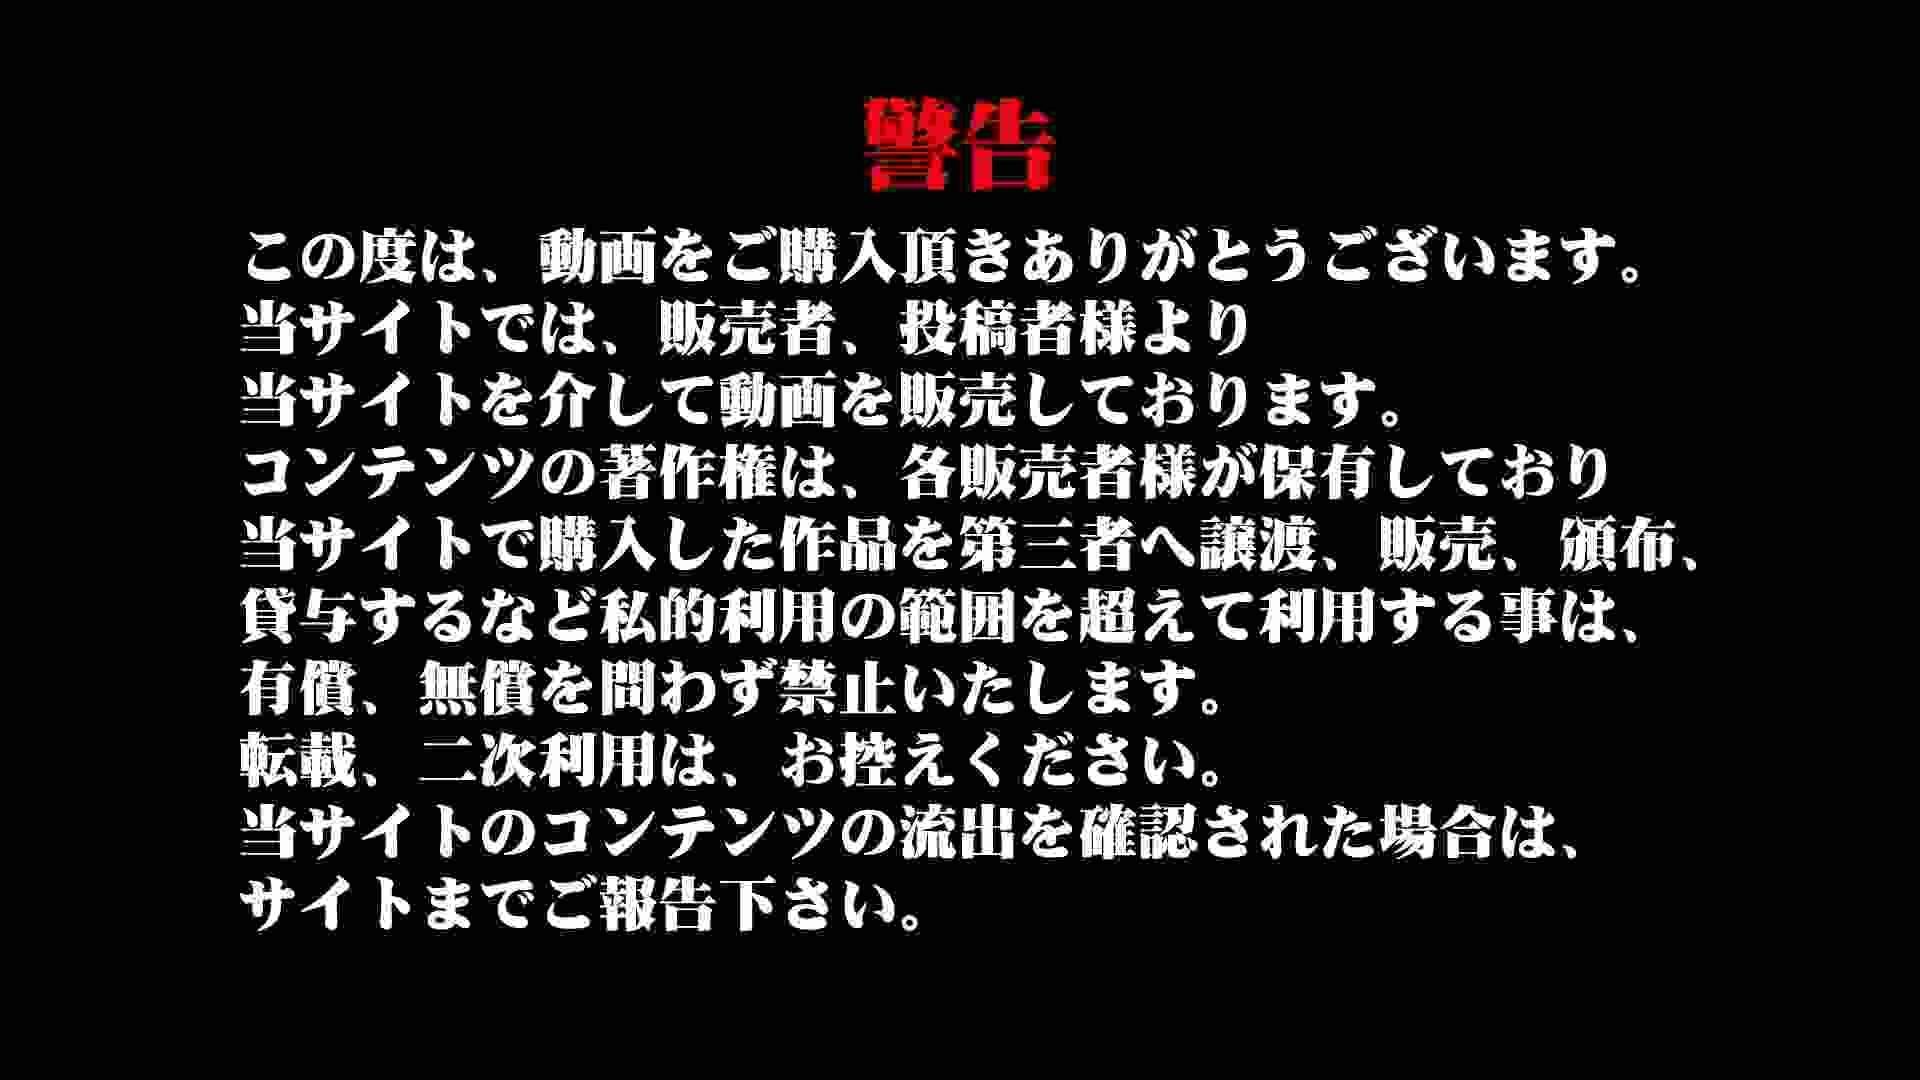 Aquaな露天風呂Vol.906 OLセックス 盗撮オマンコ無修正動画無料 92画像 2